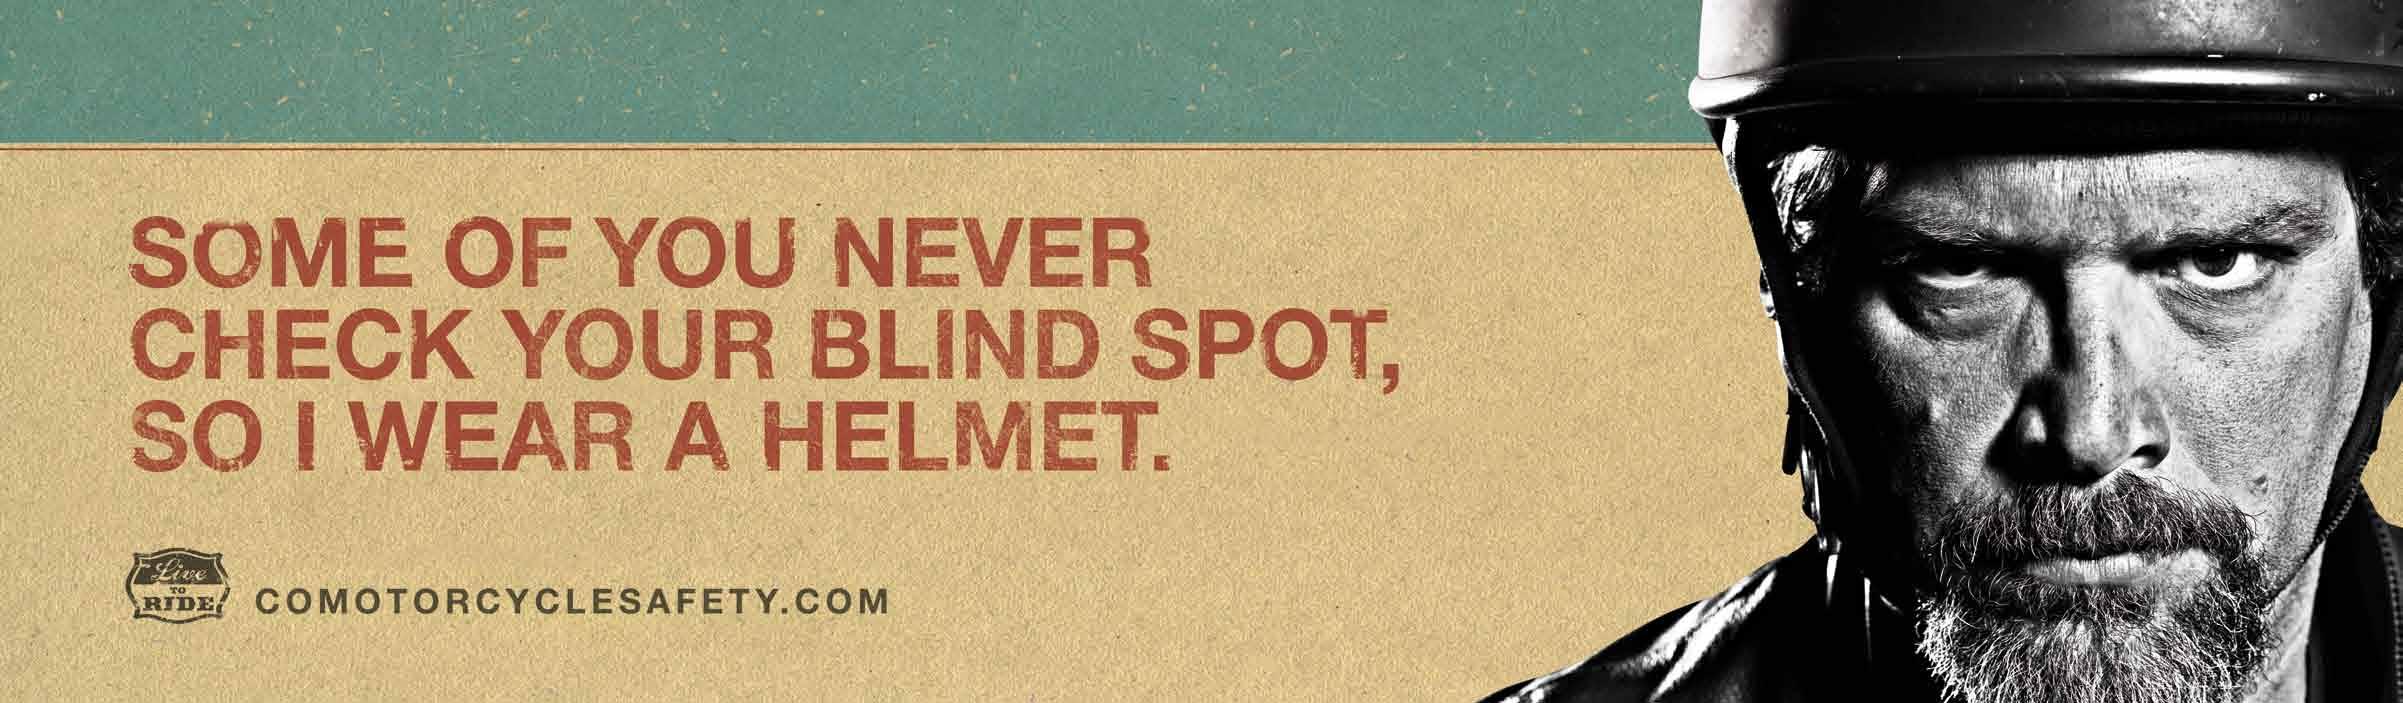 BlindSpot_Billboard.jpg detail image